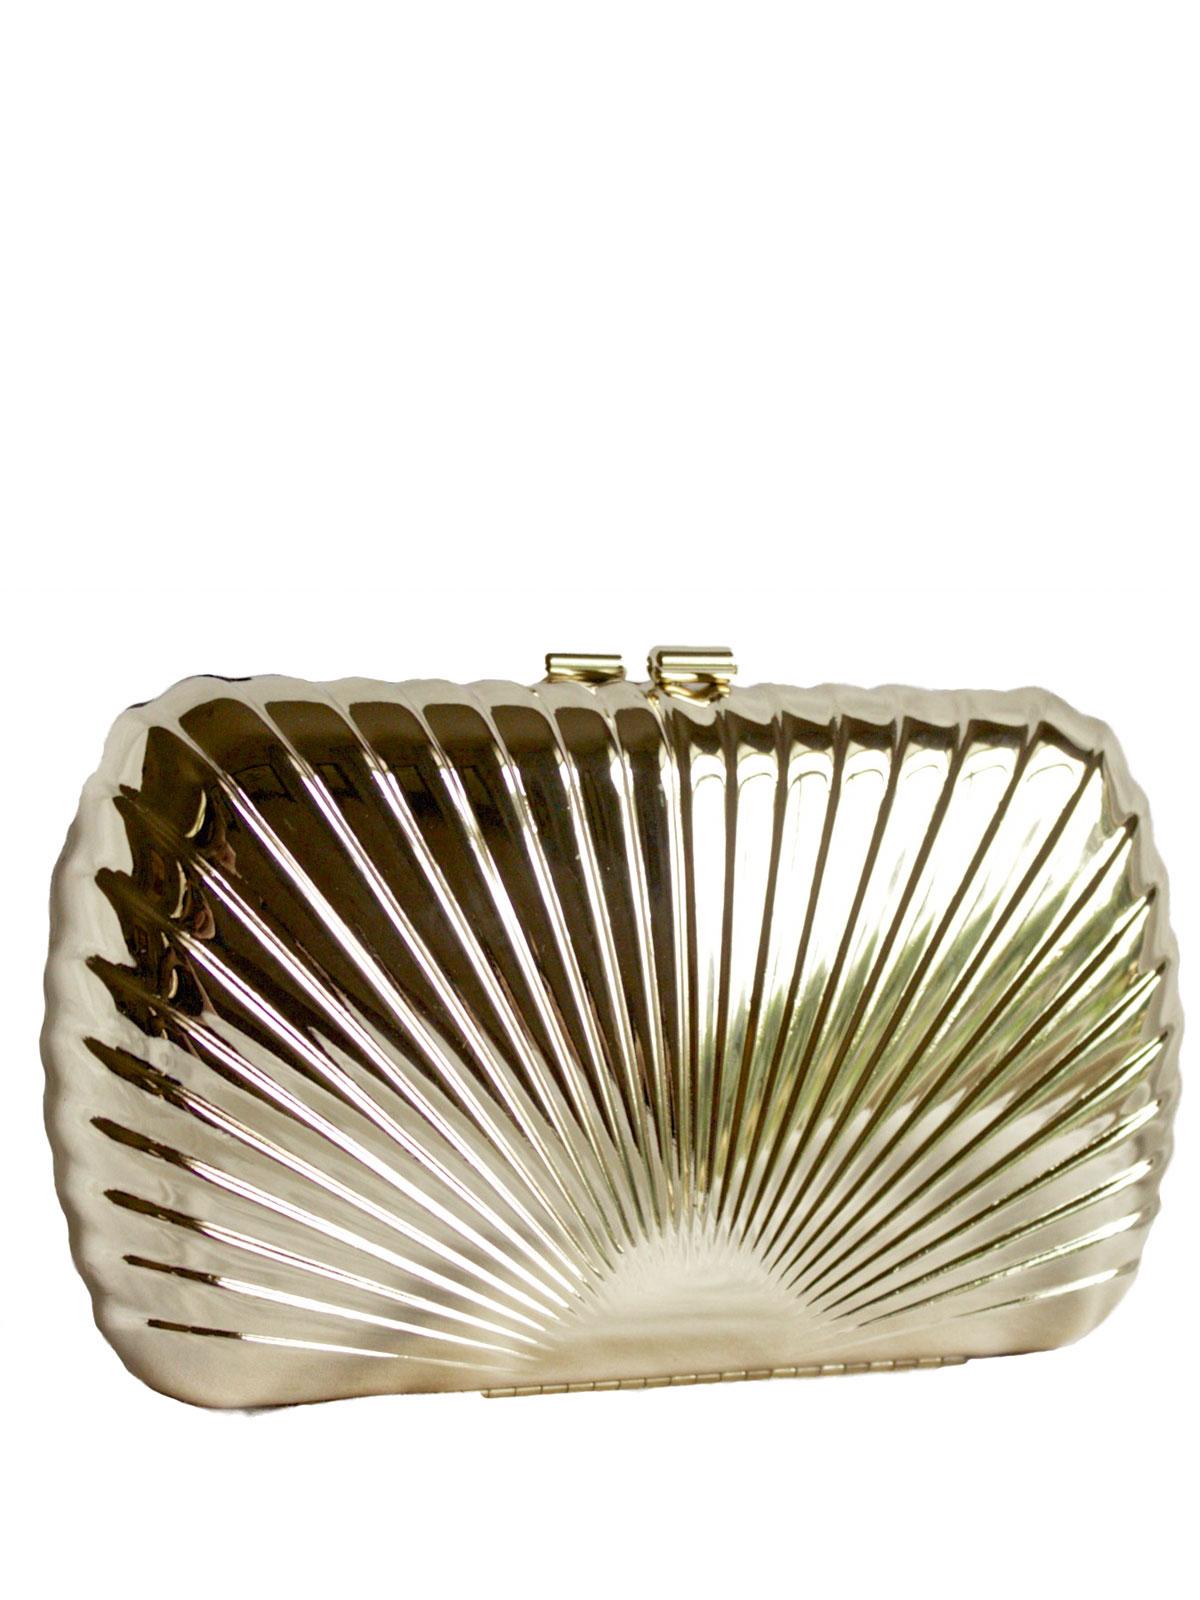 Dents Light Gold Metal Shell Clutch Bag Purse